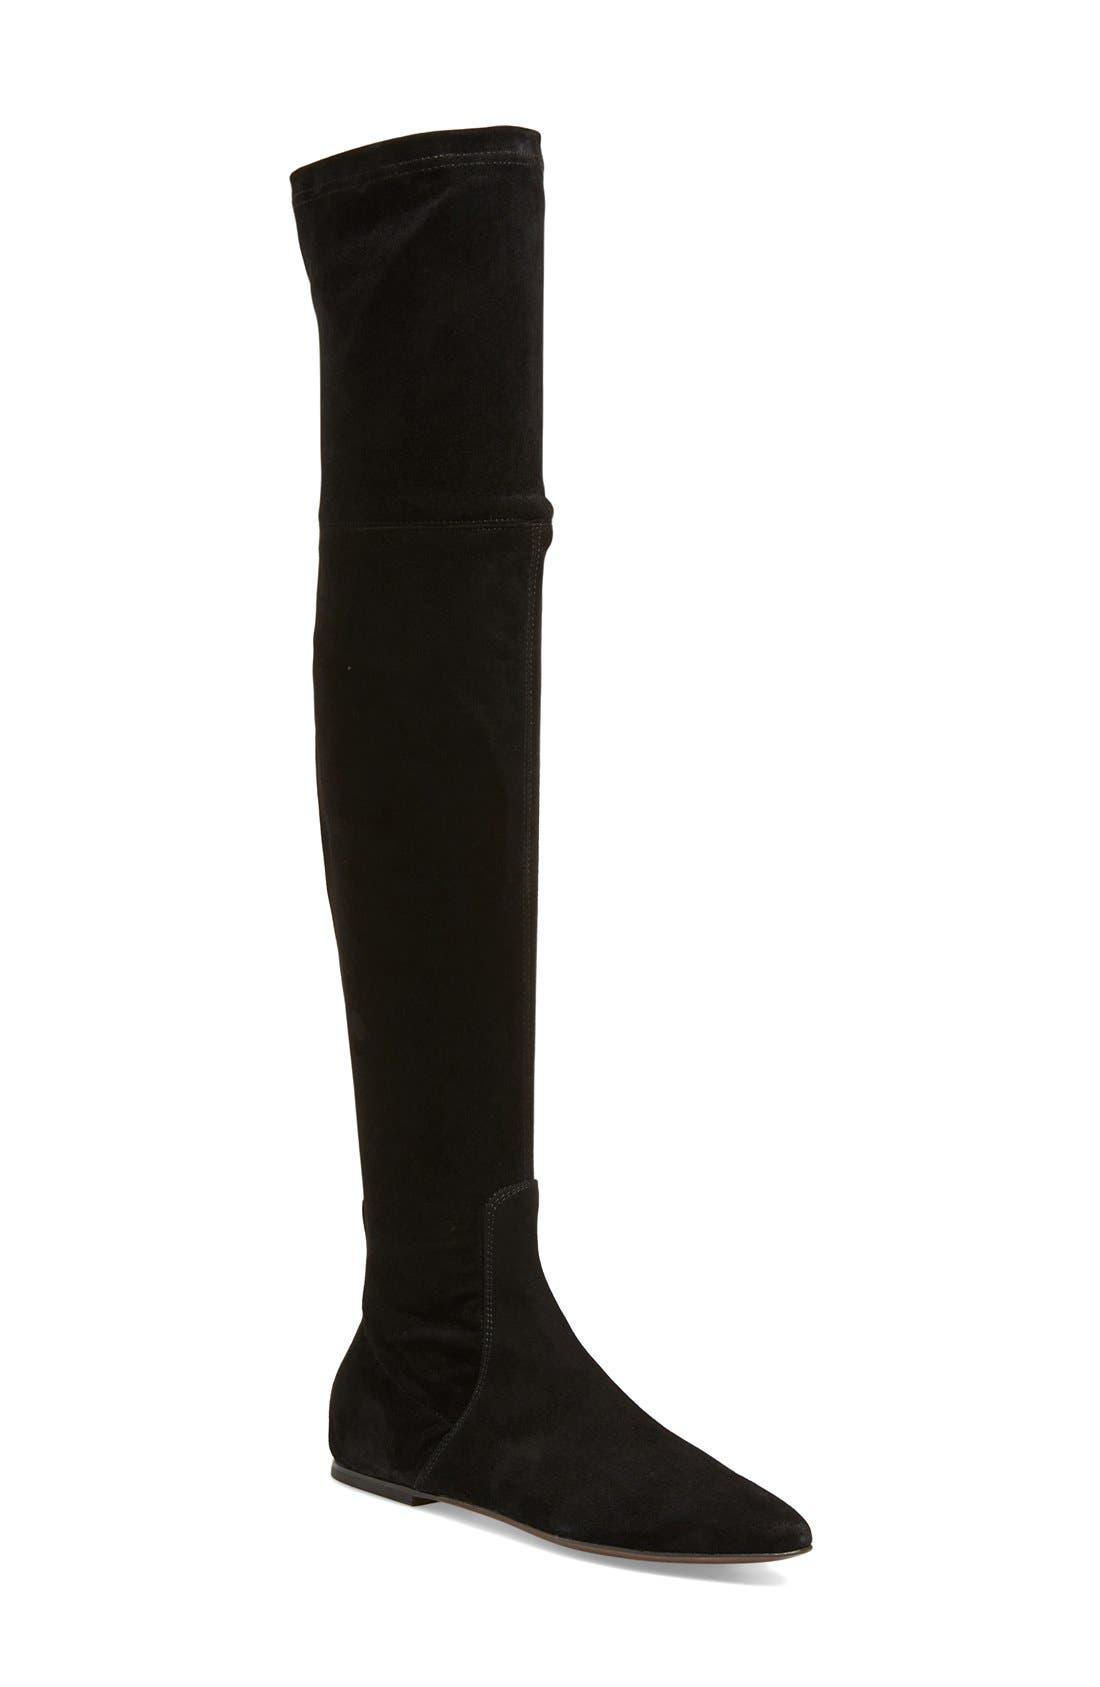 Alternate Image 1 Selected - Attilio Giusti Leombruni Over the Knee Boot (Women)